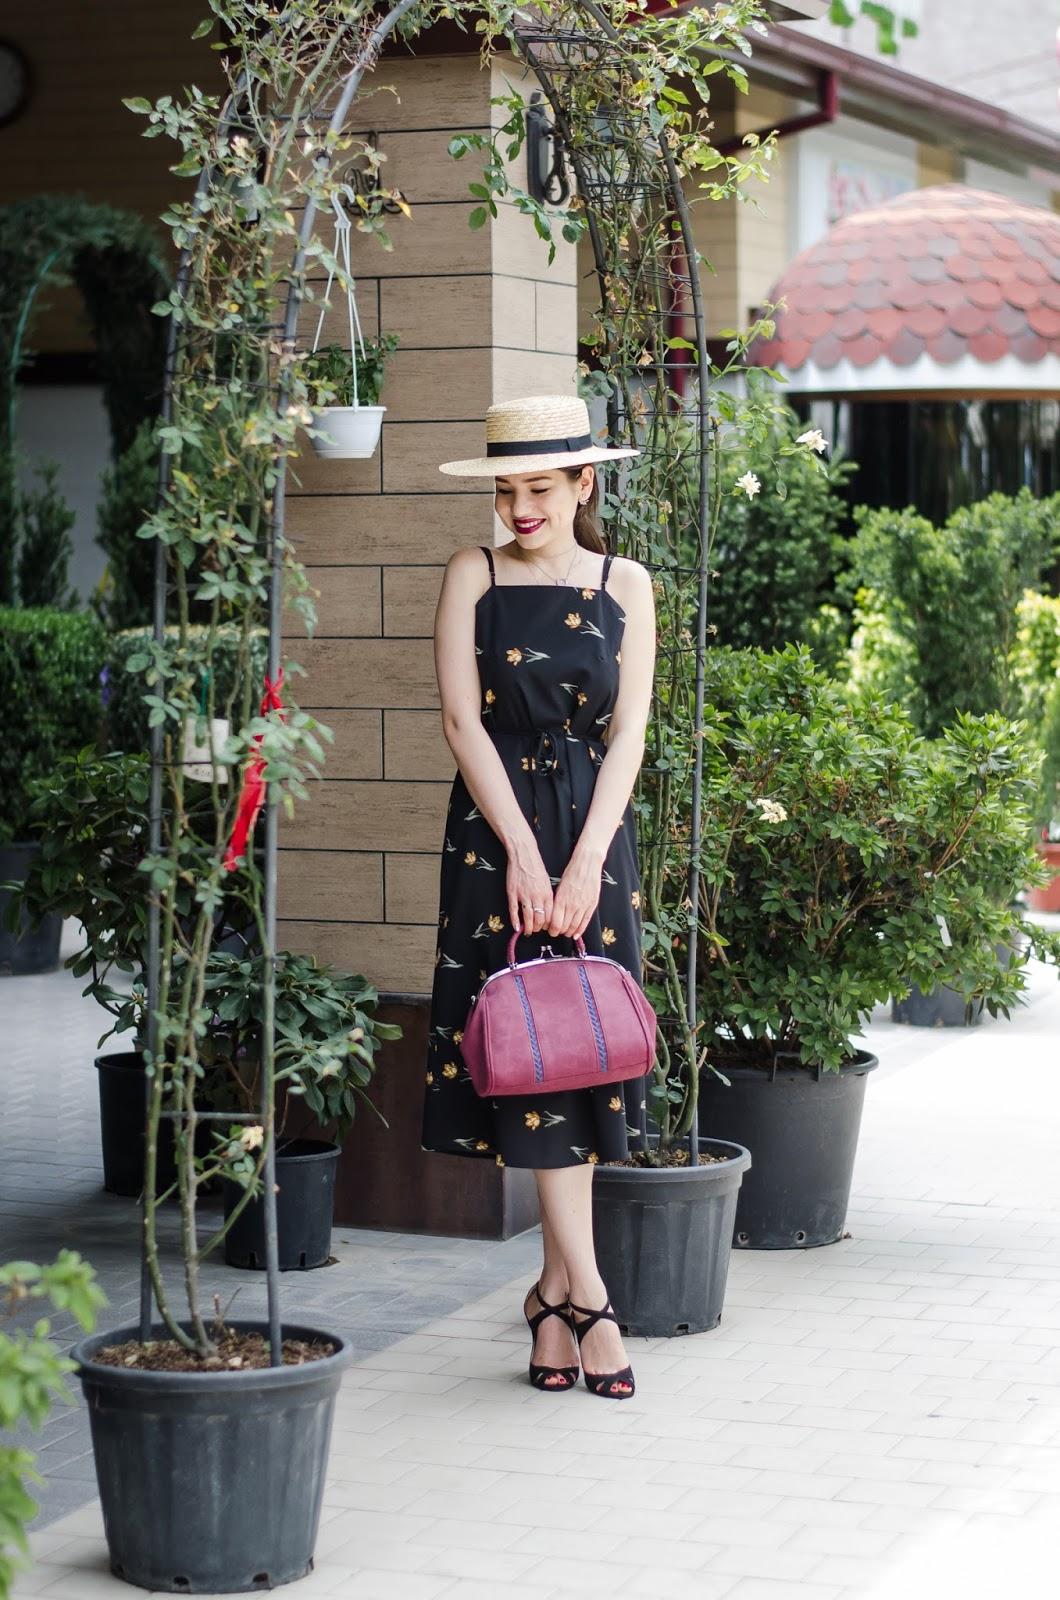 fashion blogger fashion diyorasnotes diyora beta cami dress midi dress straw hat asos heeled sandals outfit summer look 2017 lookbook street style